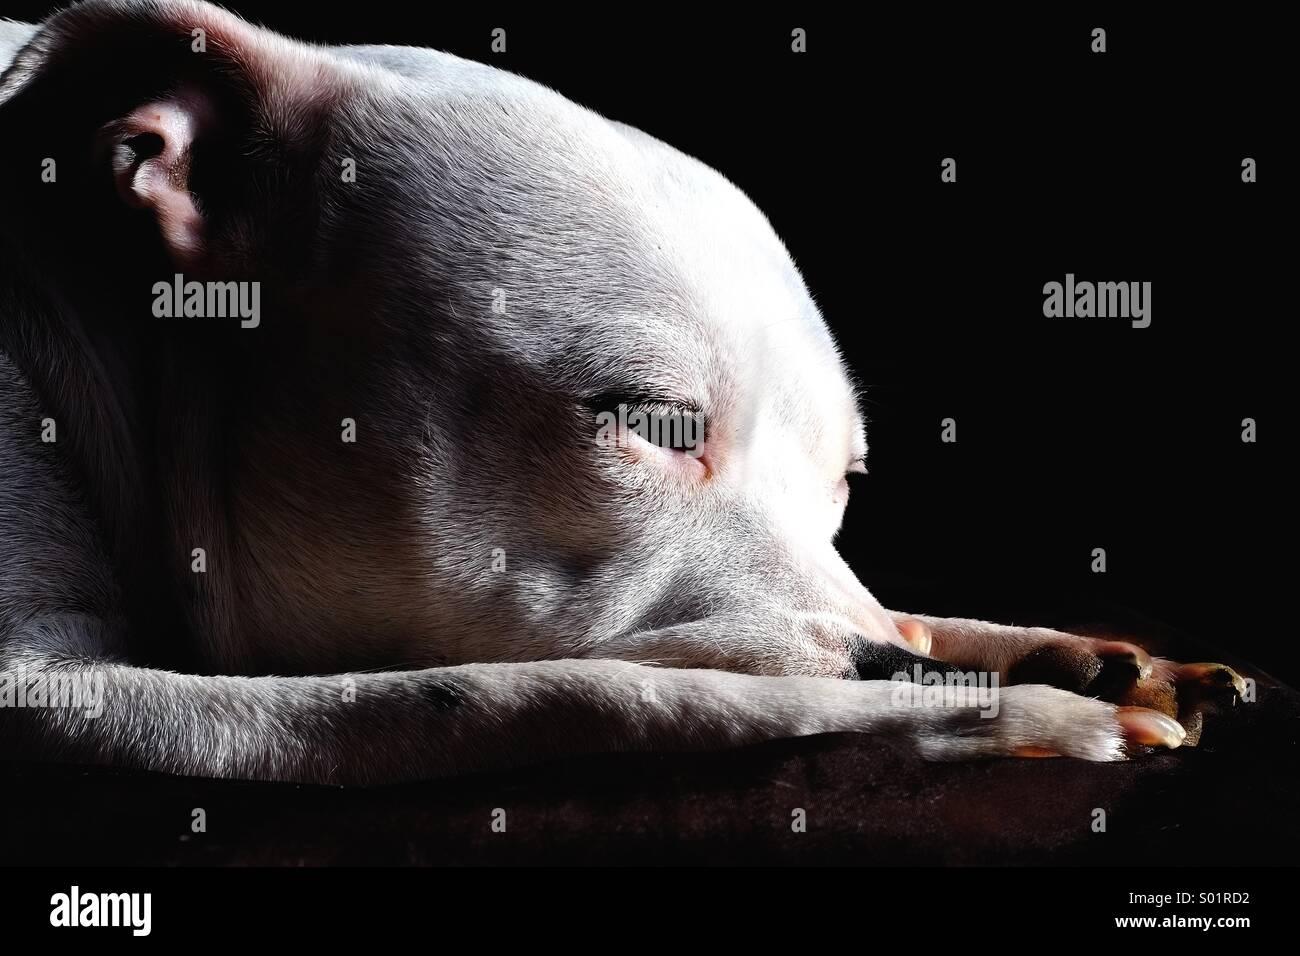 Hund-Porträt Stockbild